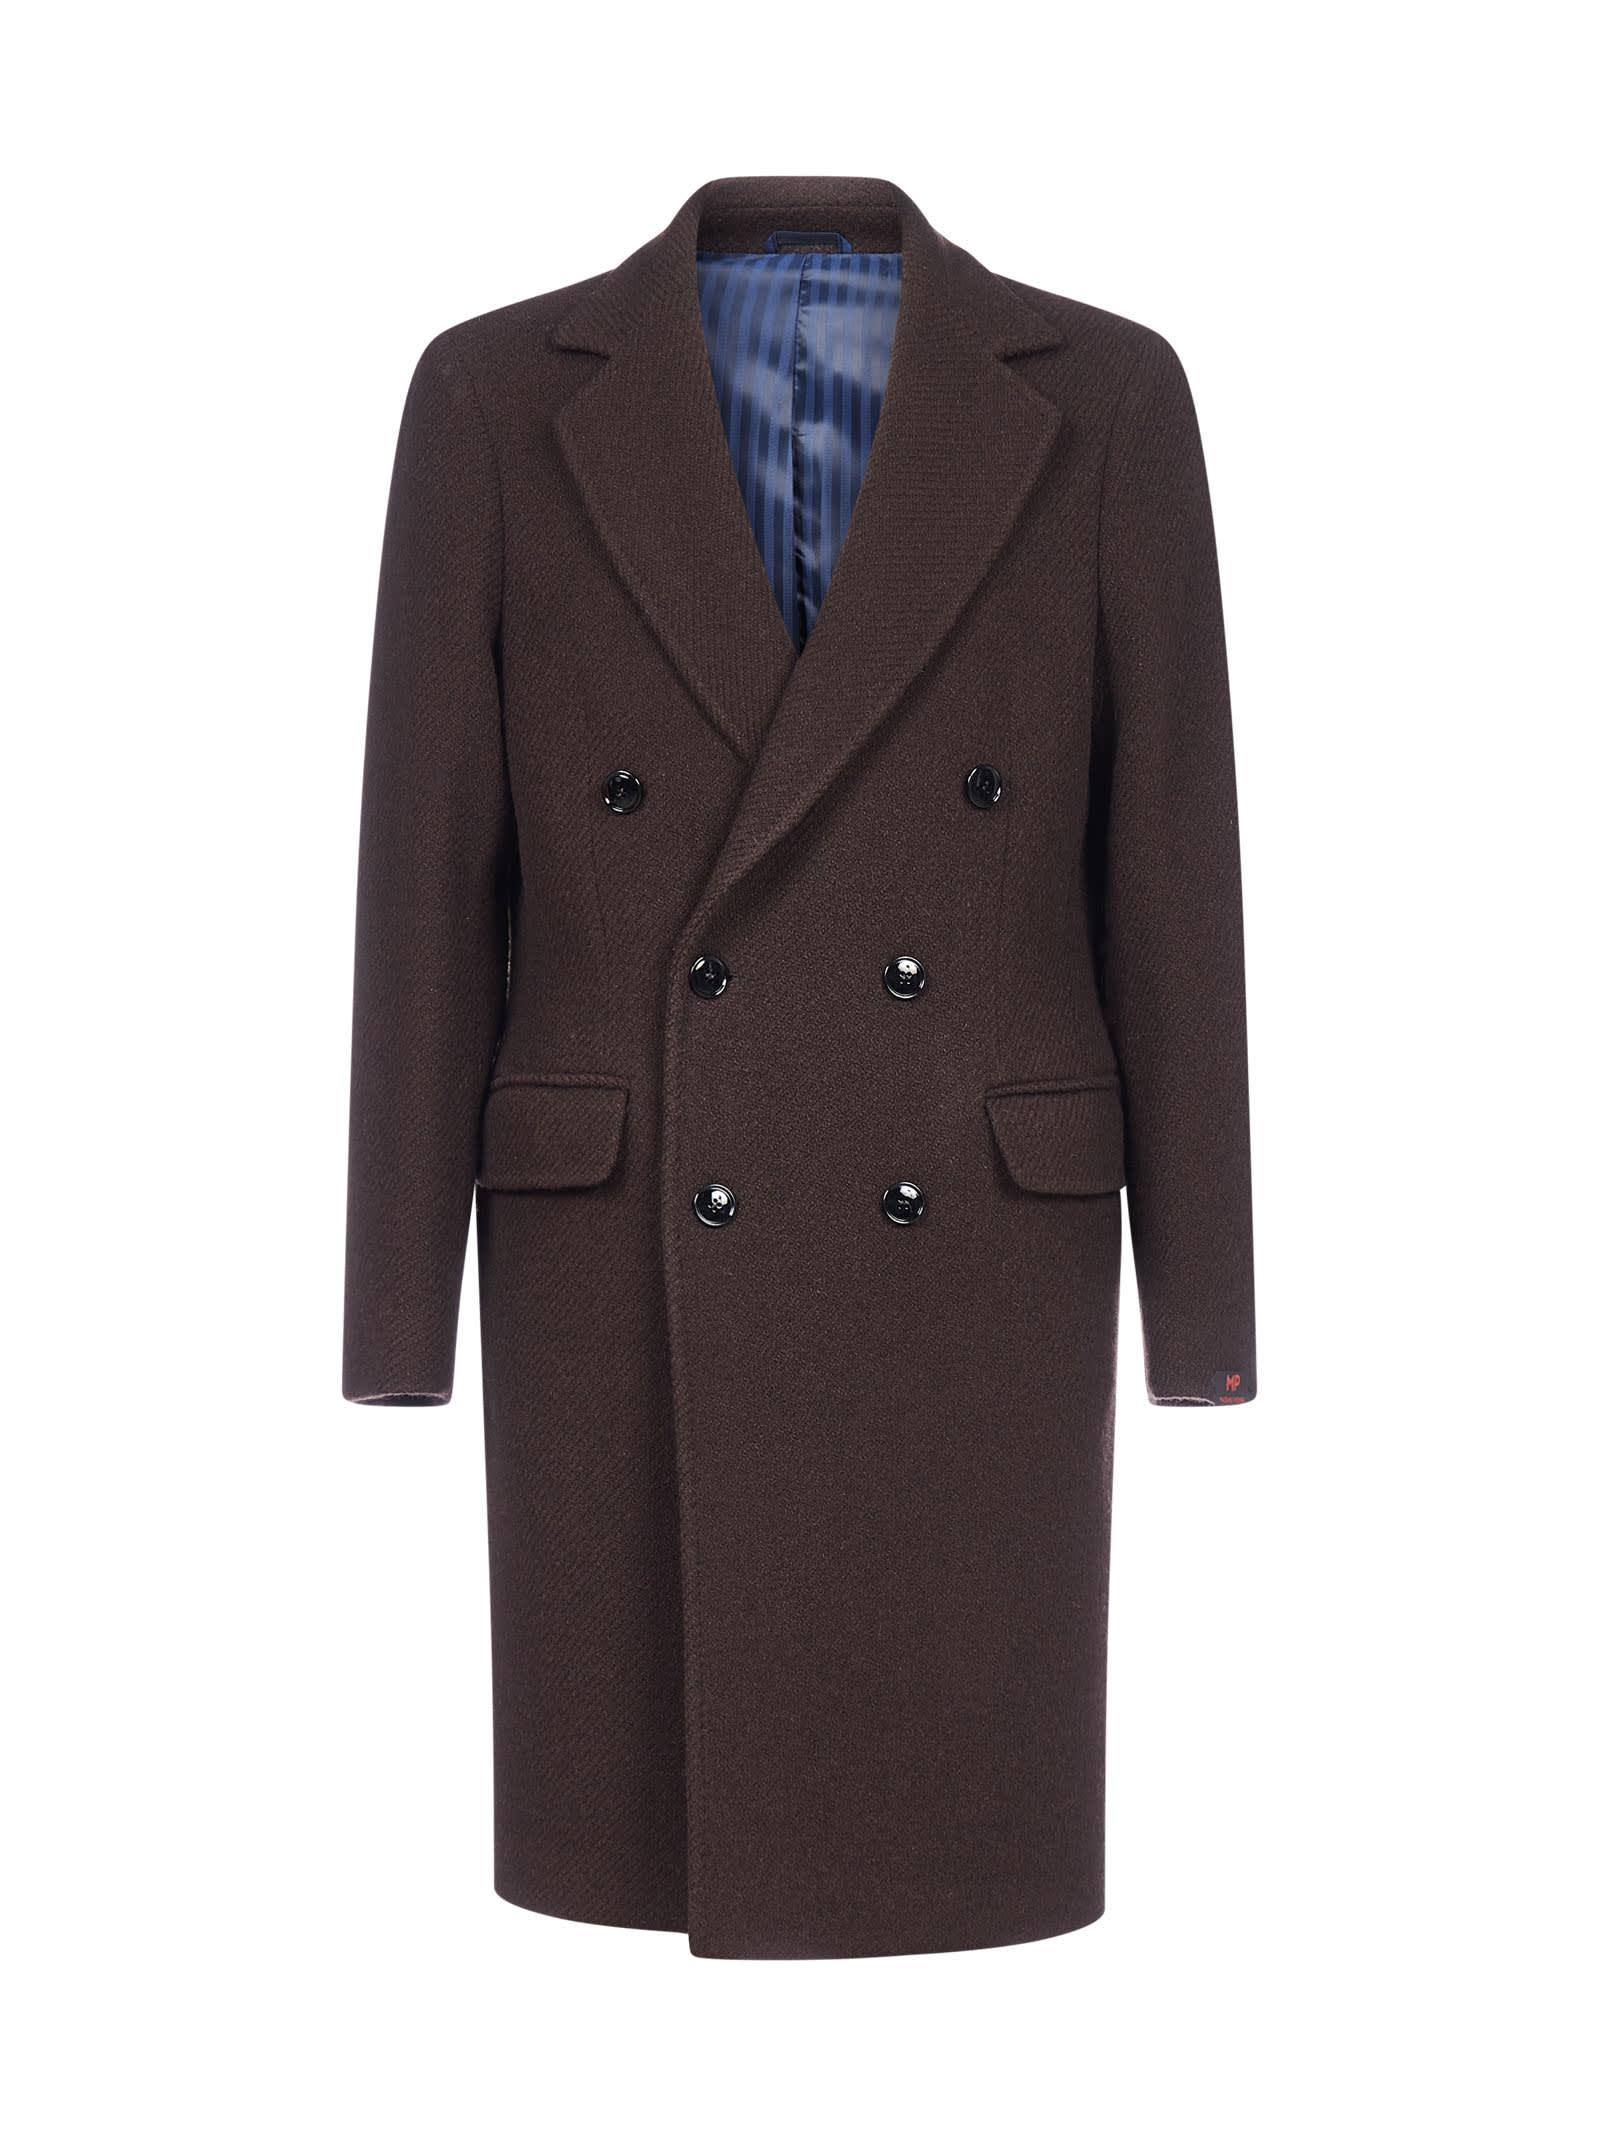 Roger Double-breasted Virgin Wool Coat